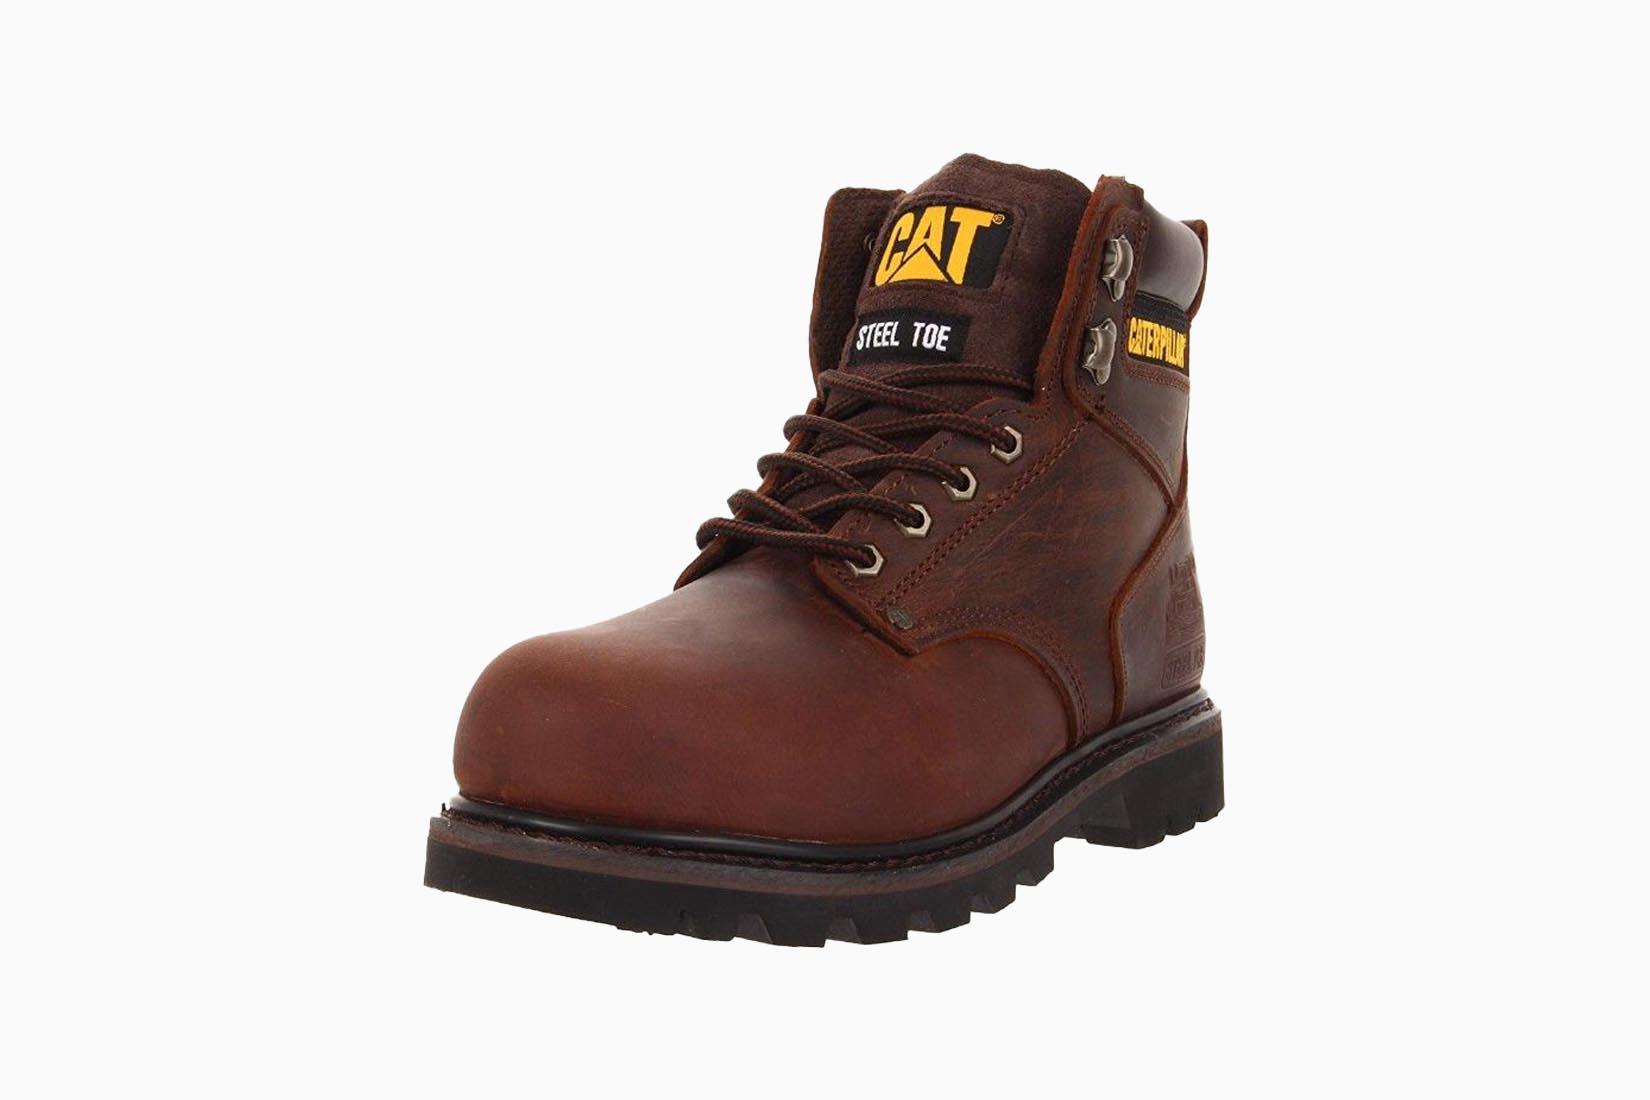 best boots men caterpillar second shift steel toe work boot review Luxe Digital